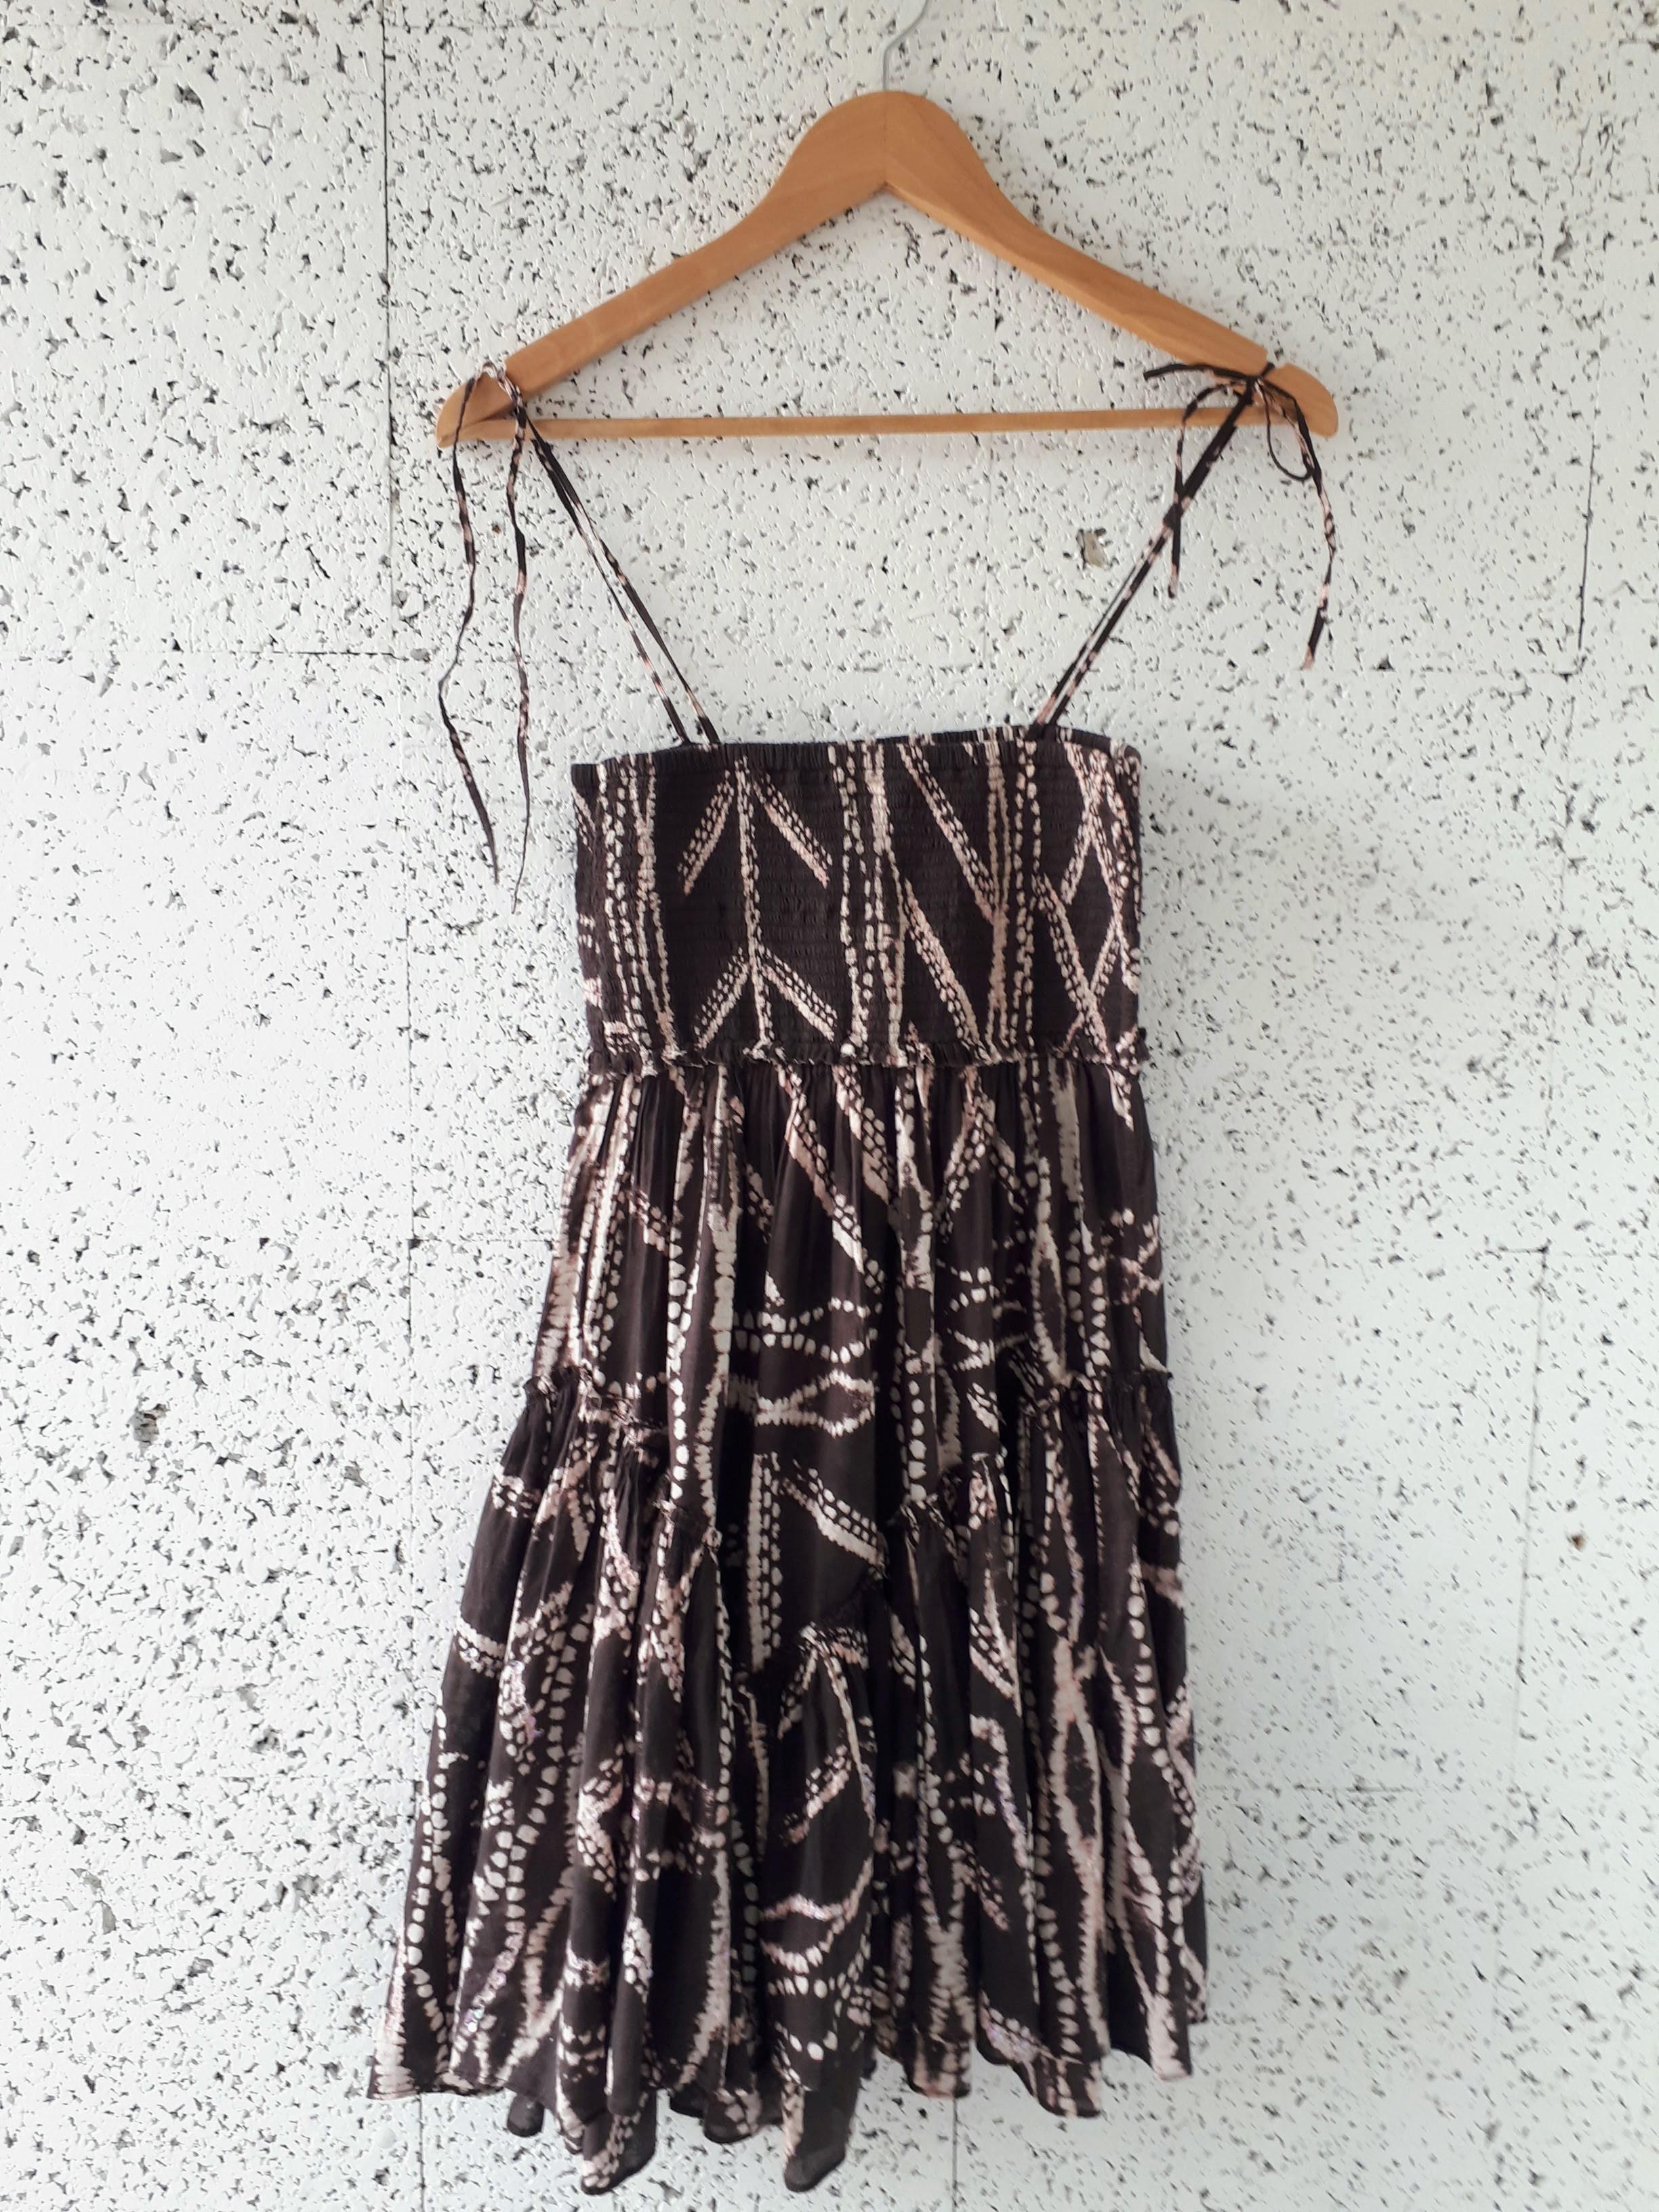 All Saints dress; Size S, $62